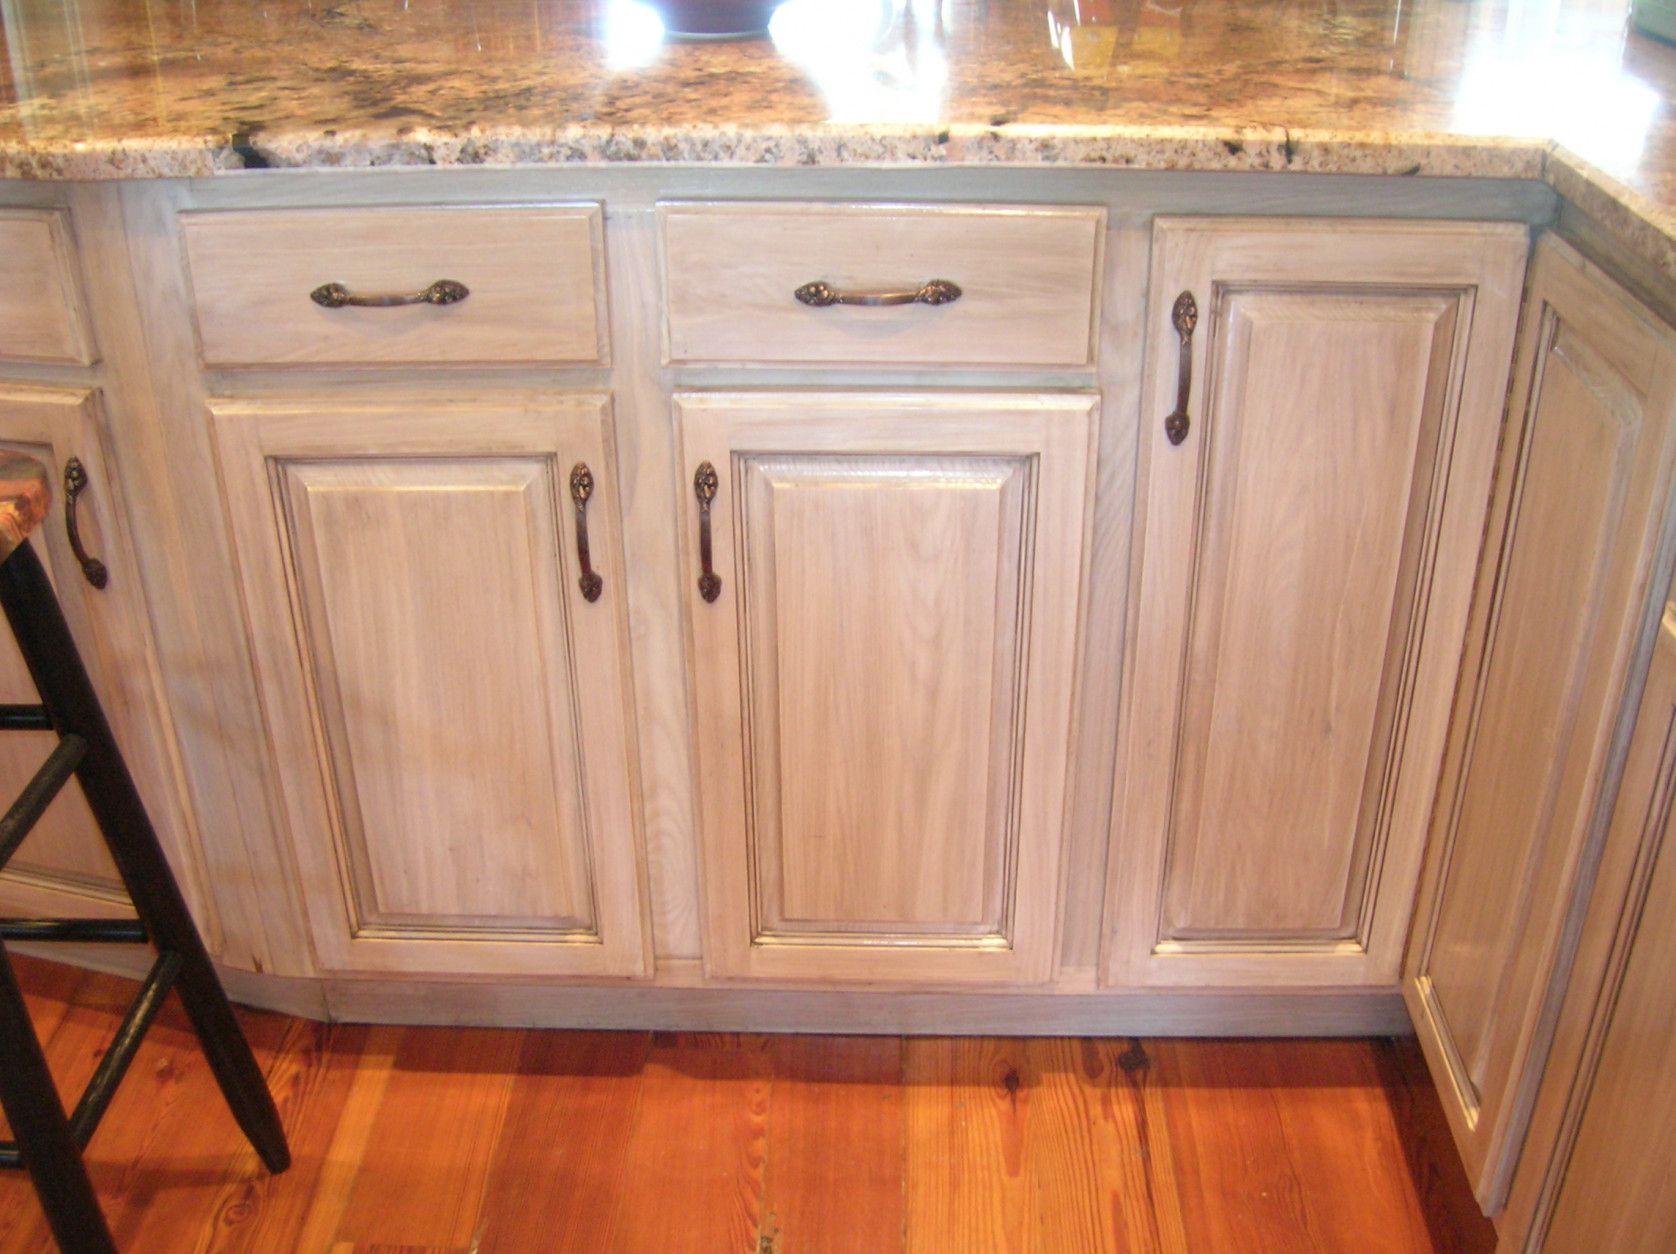 Best Kitchen Gallery: 2018 How To Pickle Oak Cabi S Unique Kitchen Backsplash Ideas of Sprucing Up Cabinets Kitchen Pickled White on rachelxblog.com